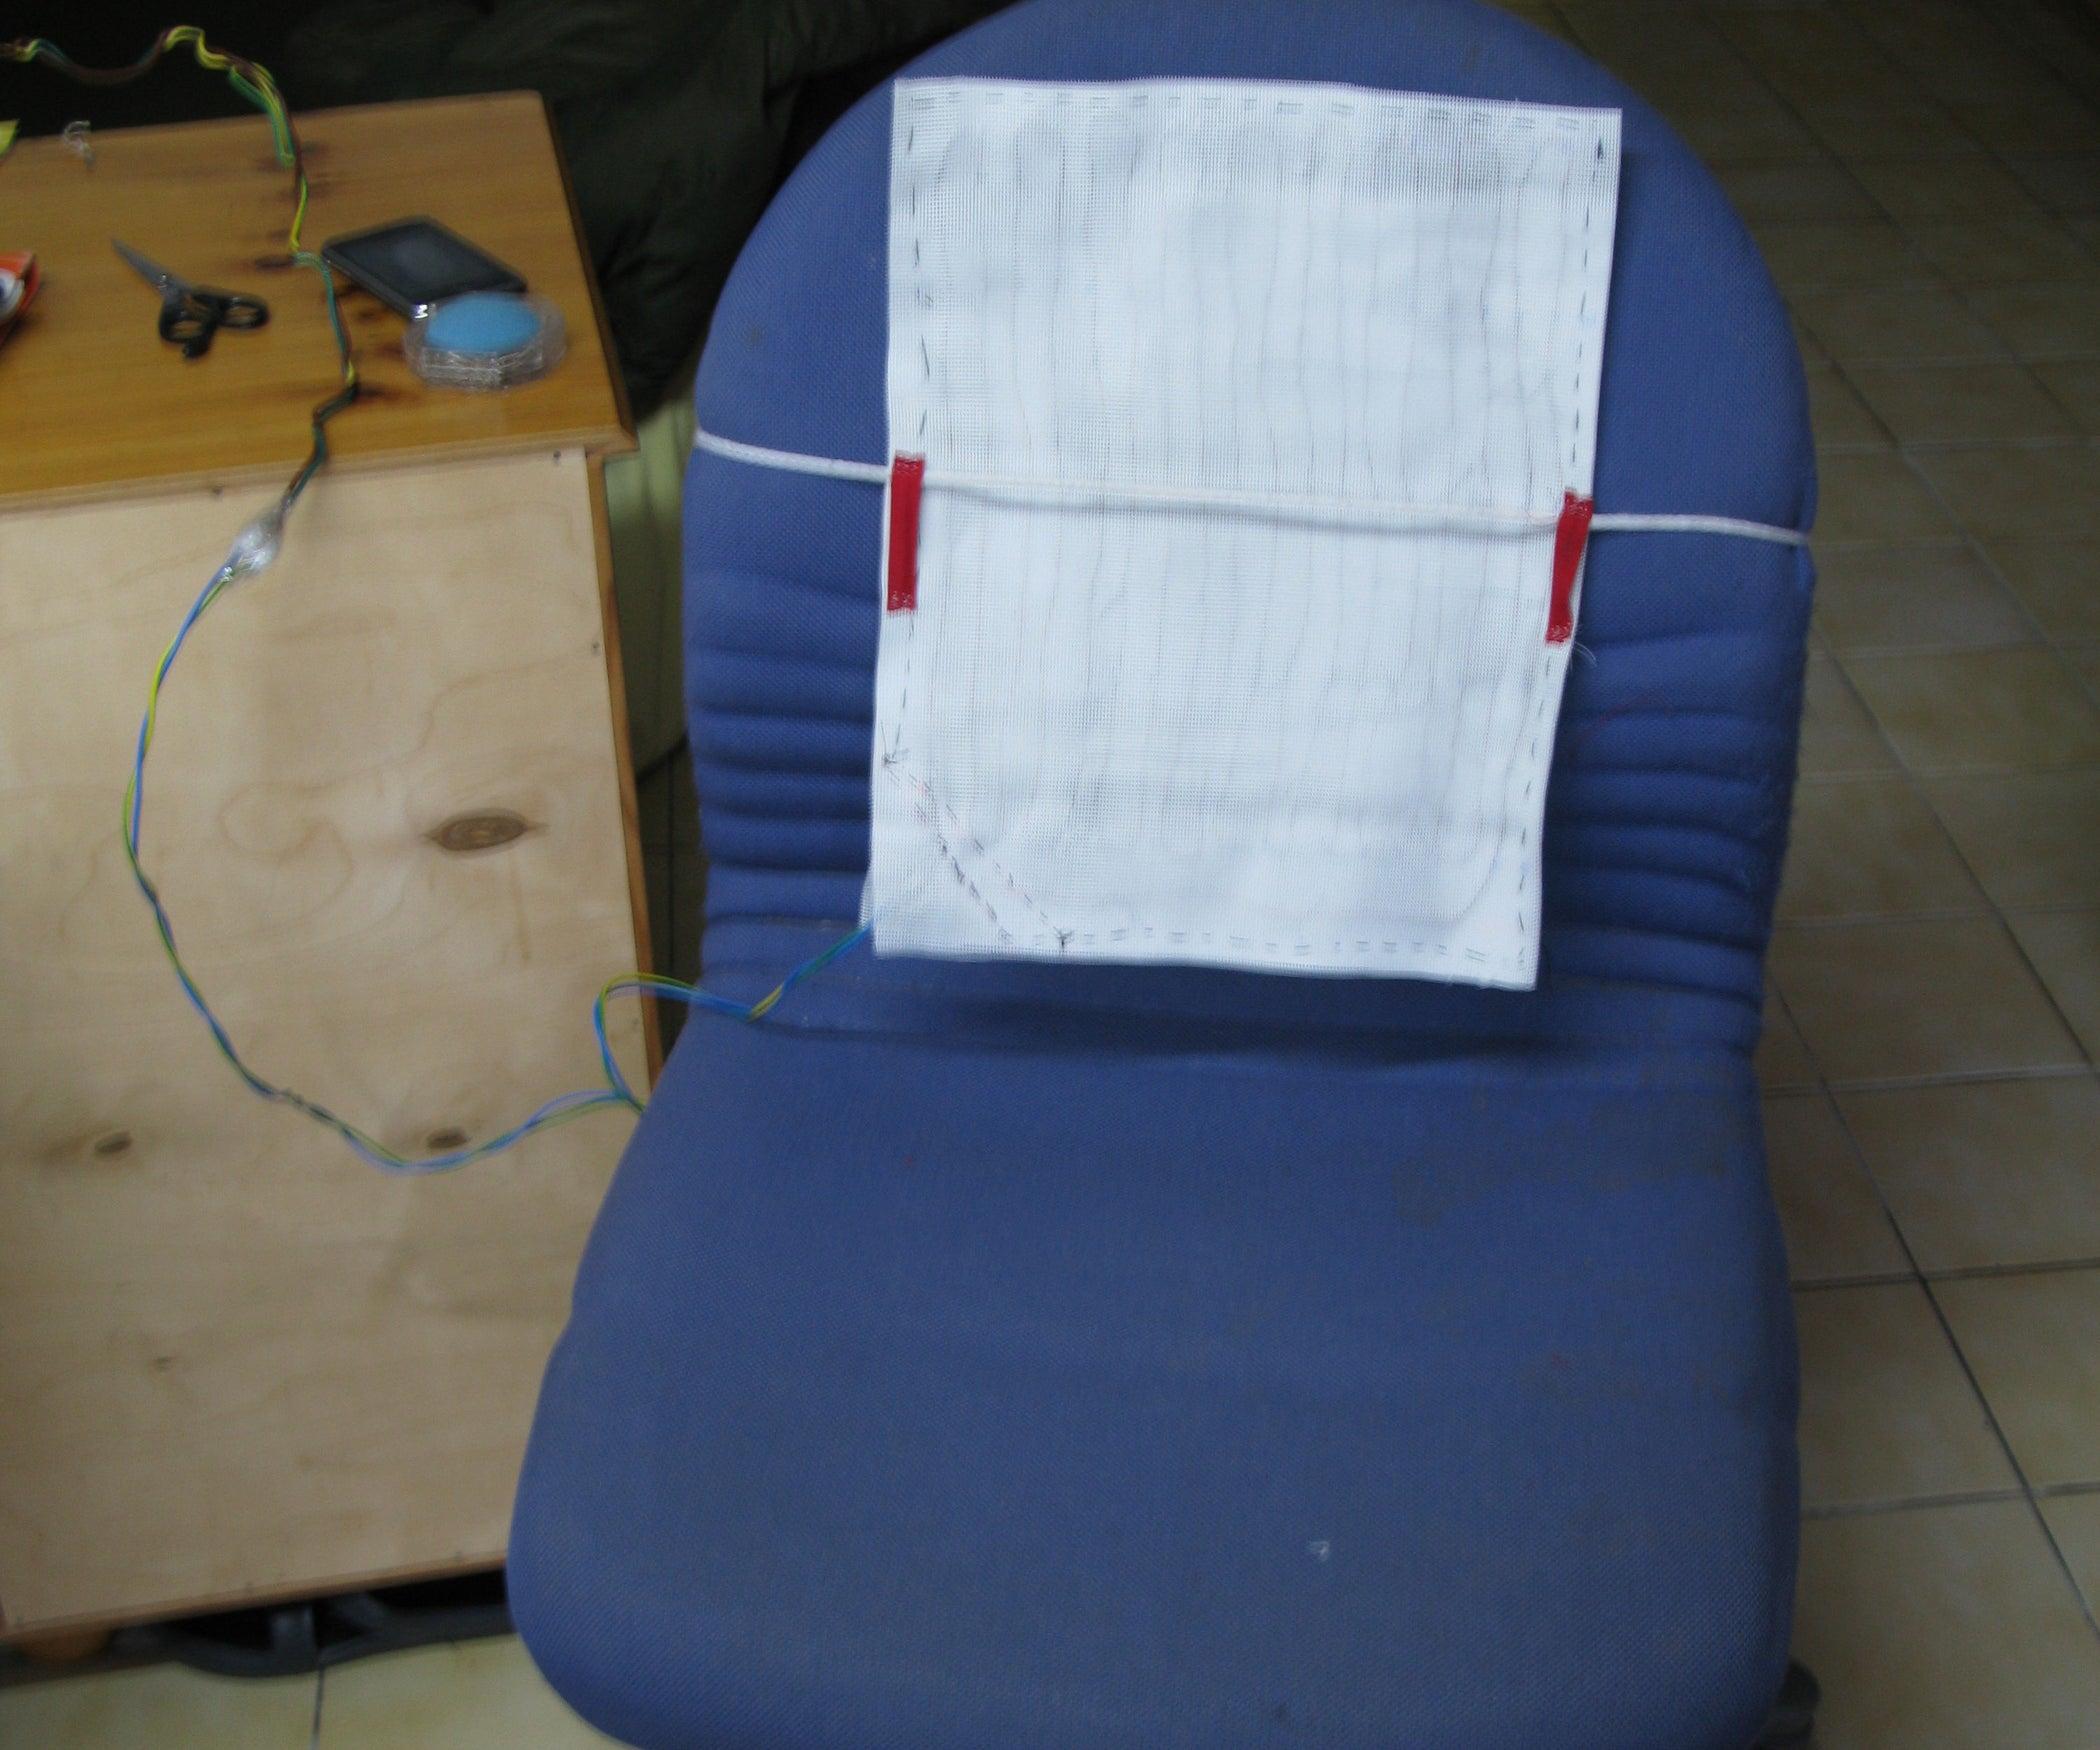 DIY Heating Pad - (small Electrical Blanket) : 8 Steps ...